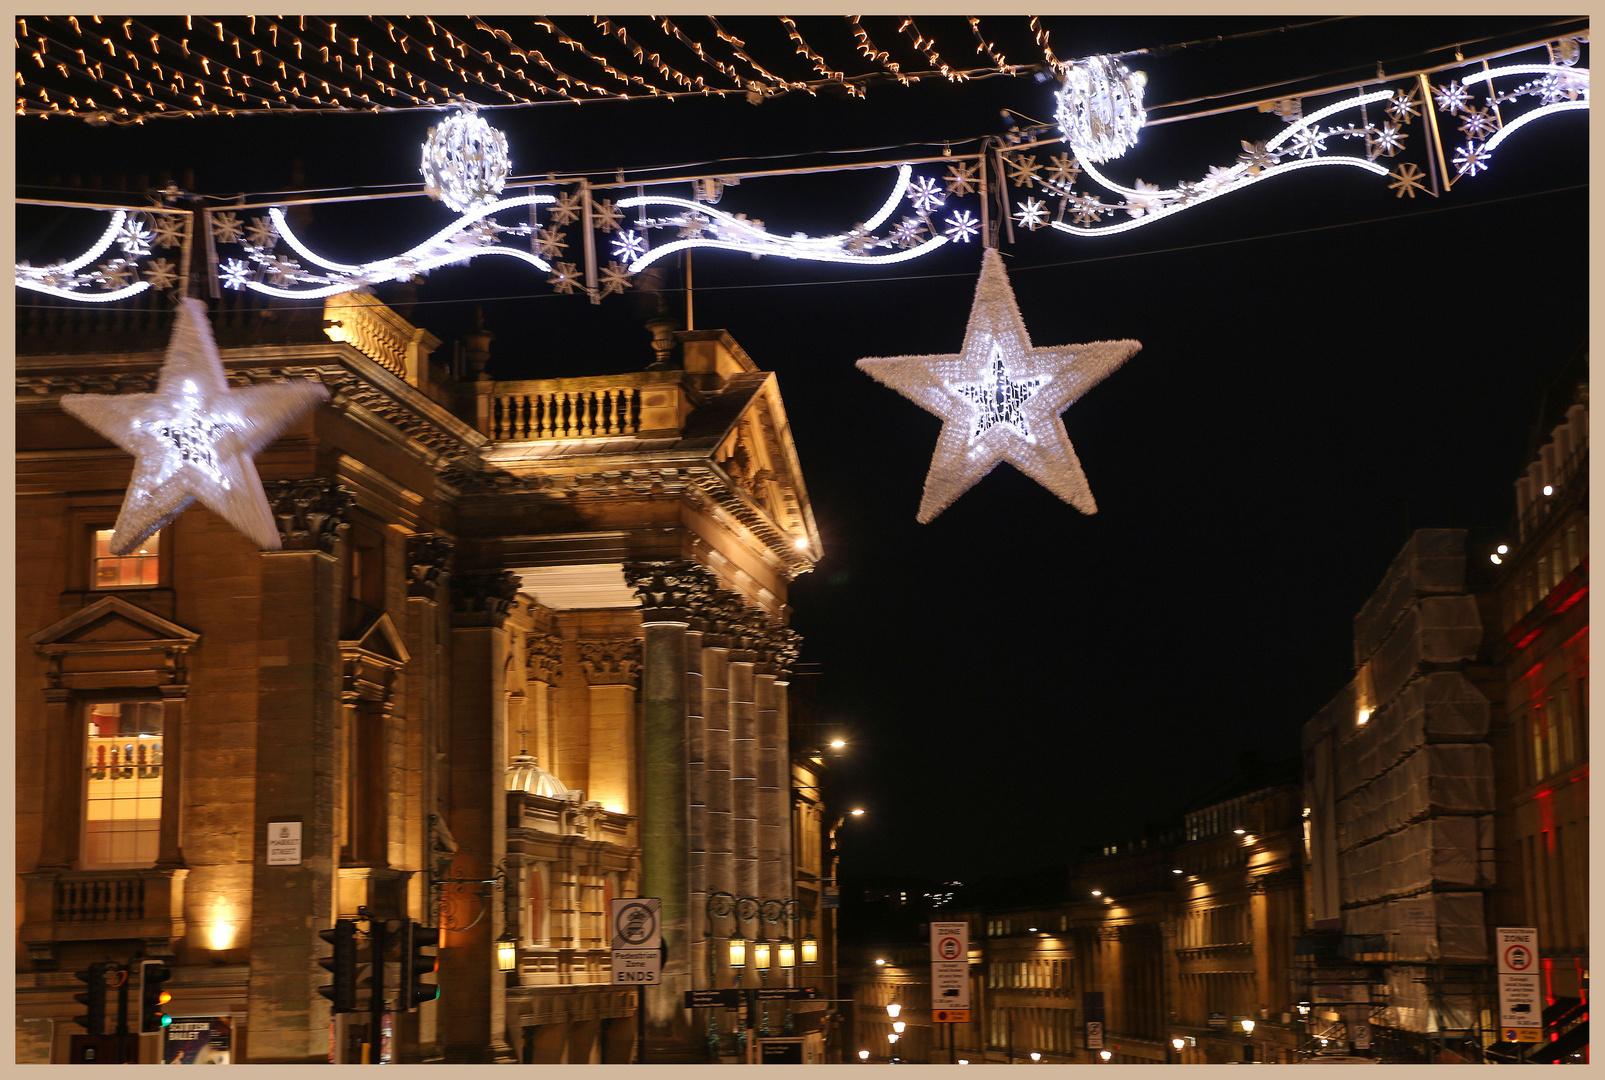 Theatre Royal Newcastle at Christmas